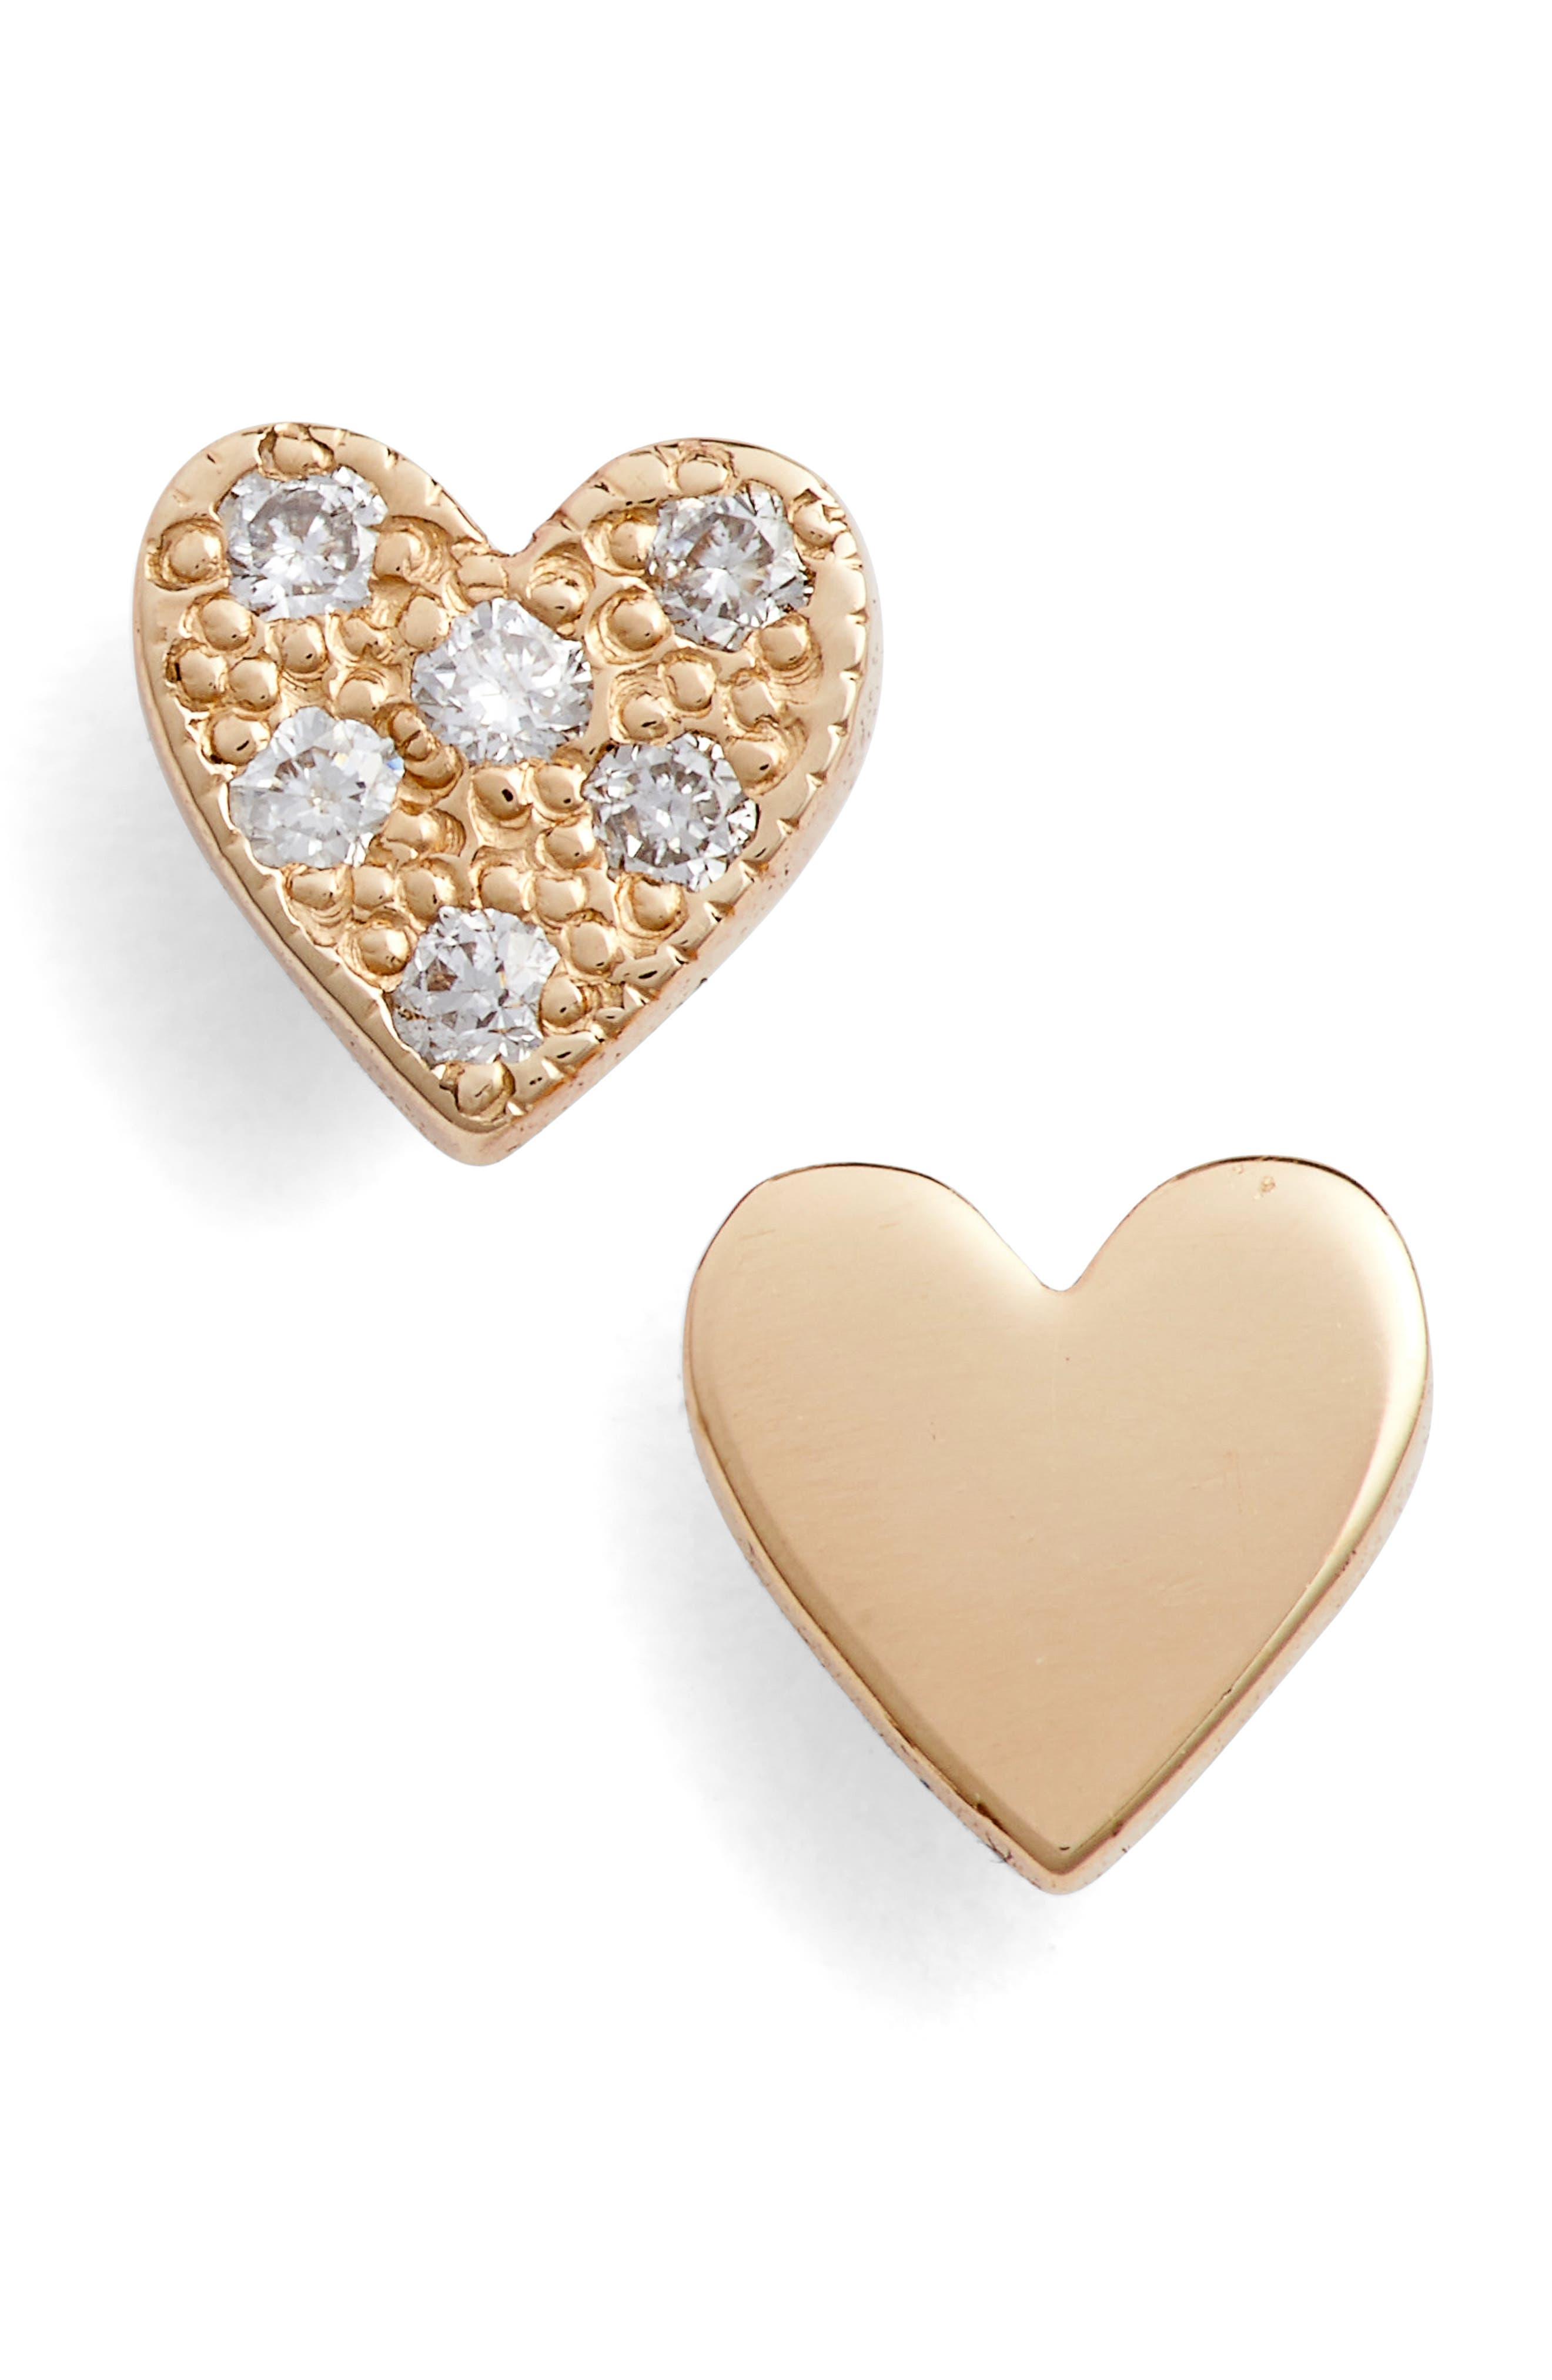 Main Image - Zoë Chicco Pavé Diamond Heart Stud Earrings